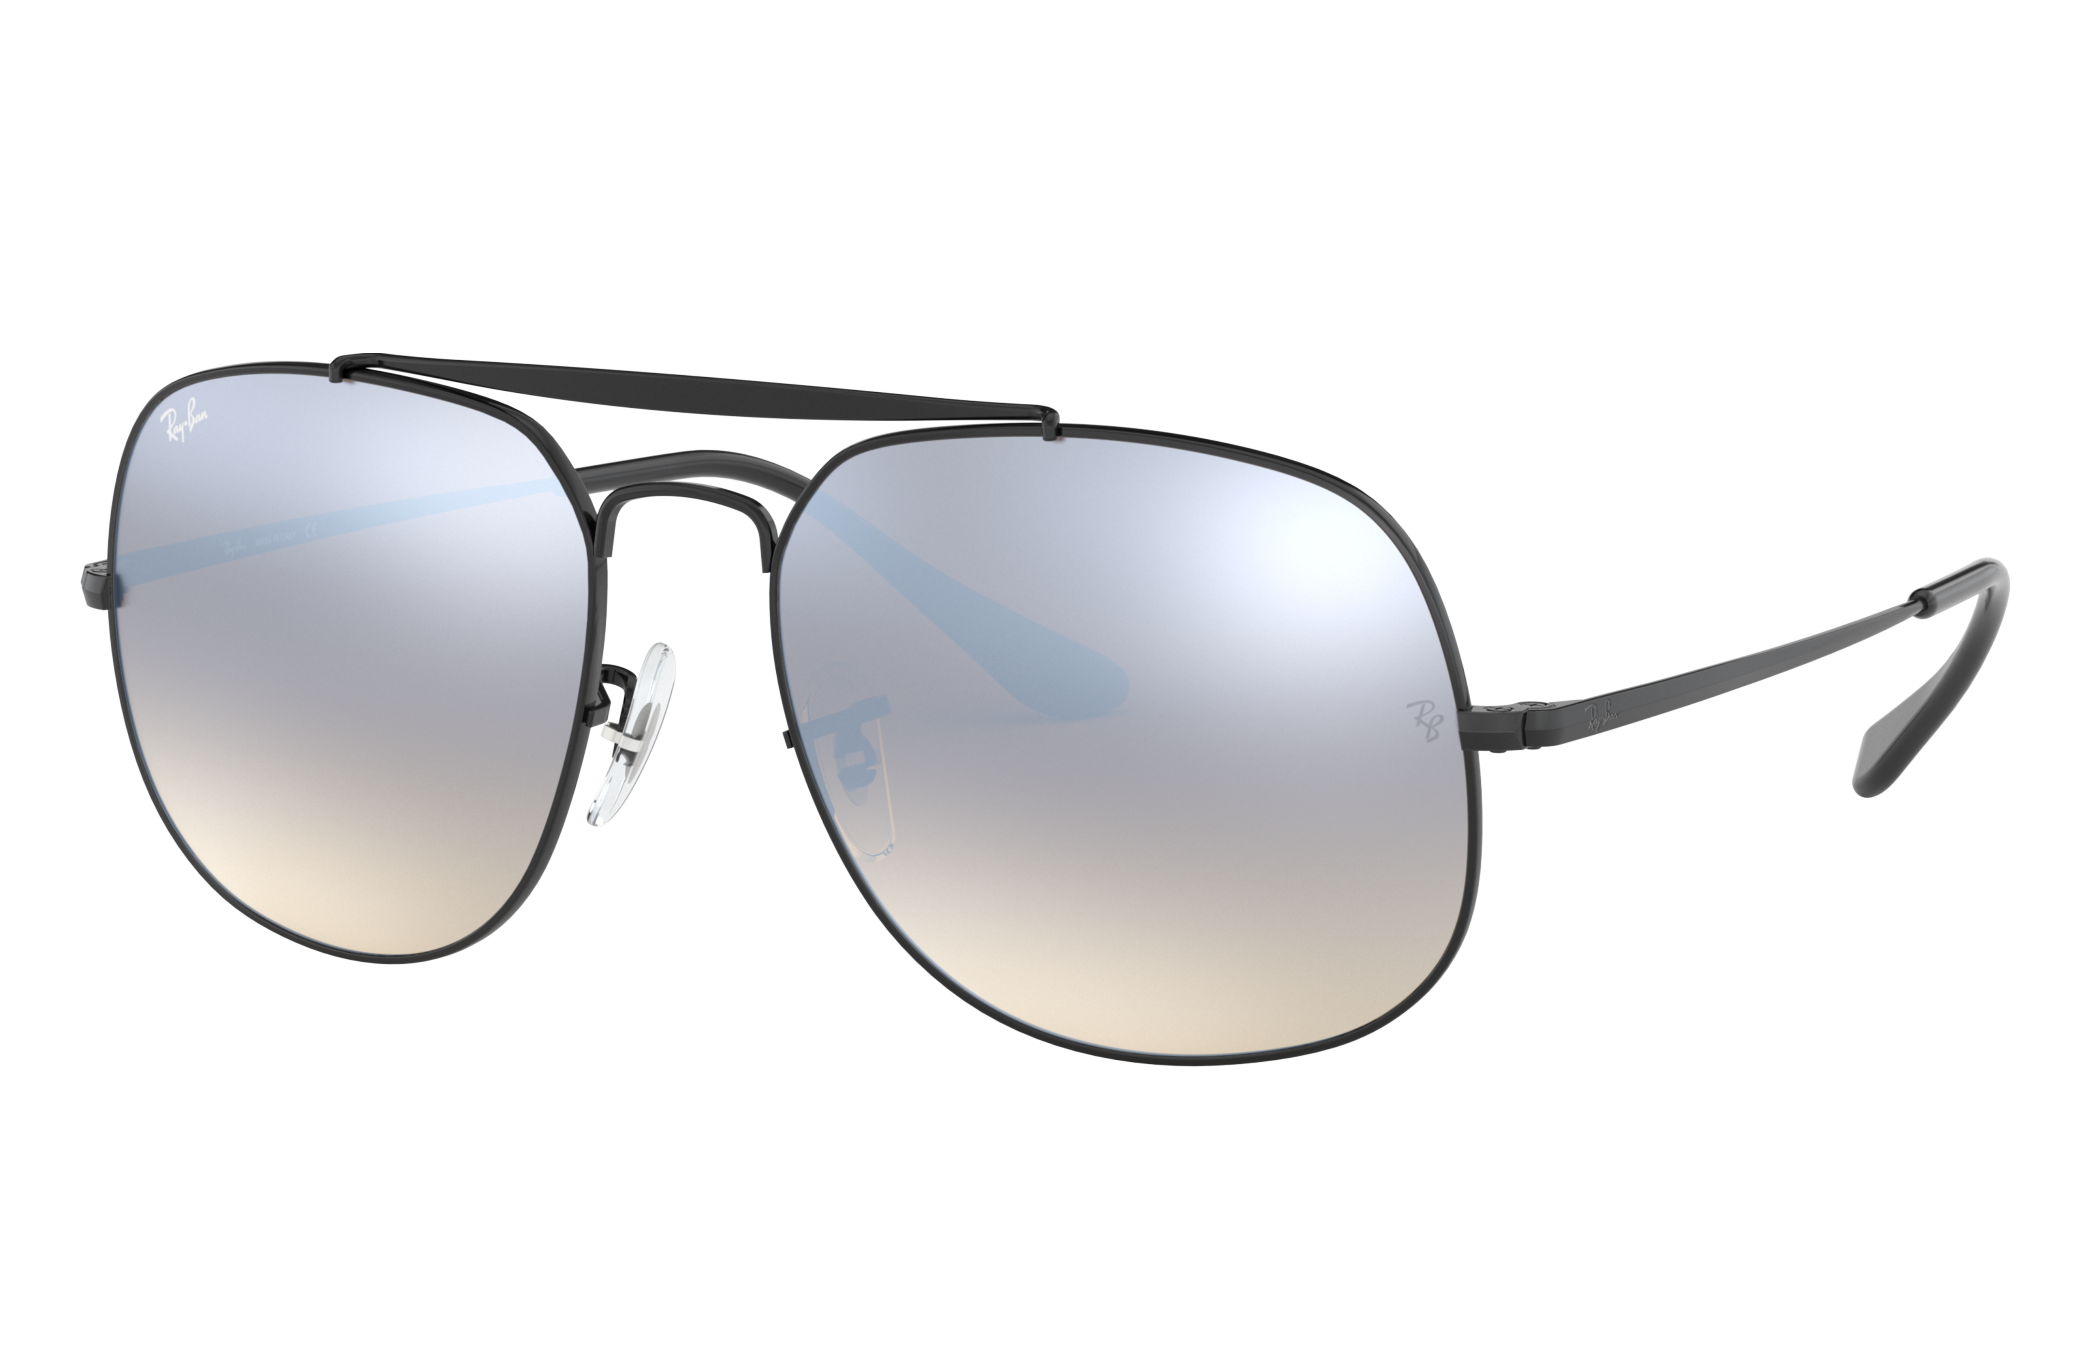 Ray-Ban General Black, Gray Lenses - RB3561